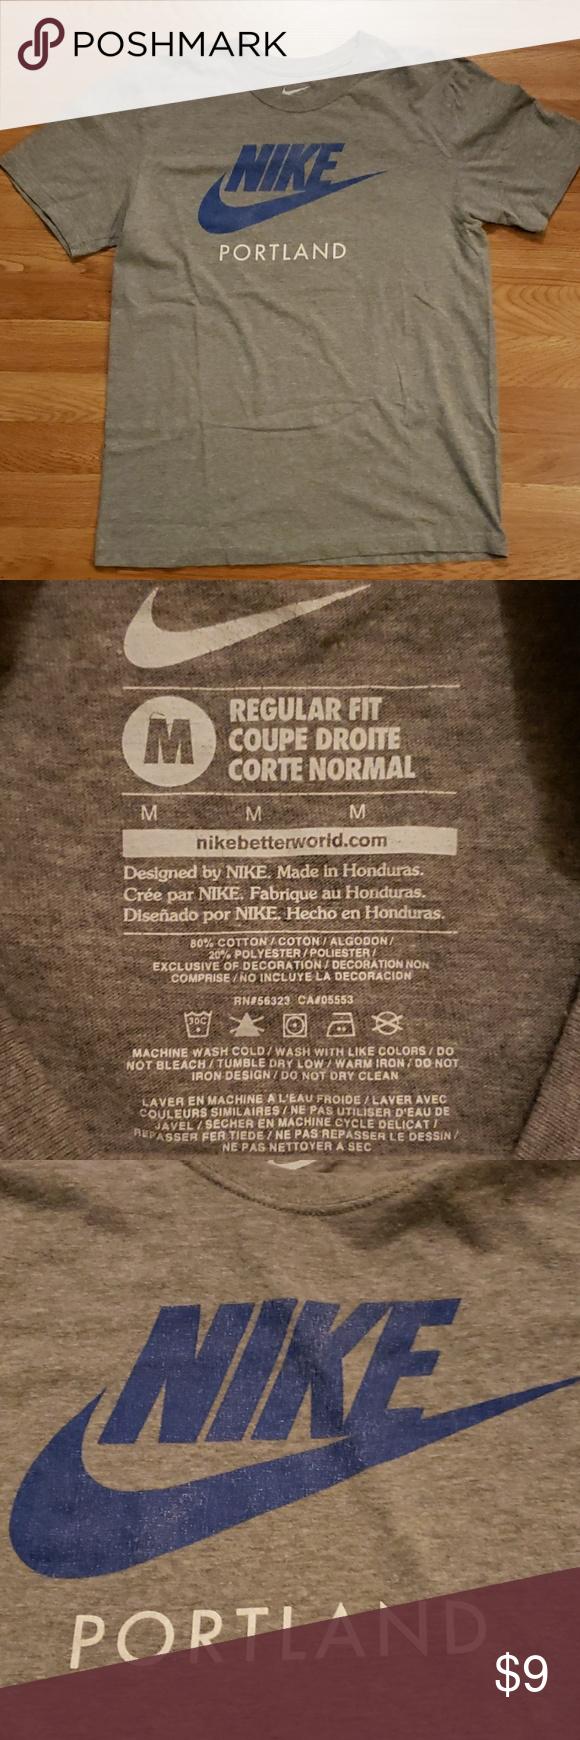 Pin D Oregon Couleur nike portland shirt gently used nike portland oregon t shirt